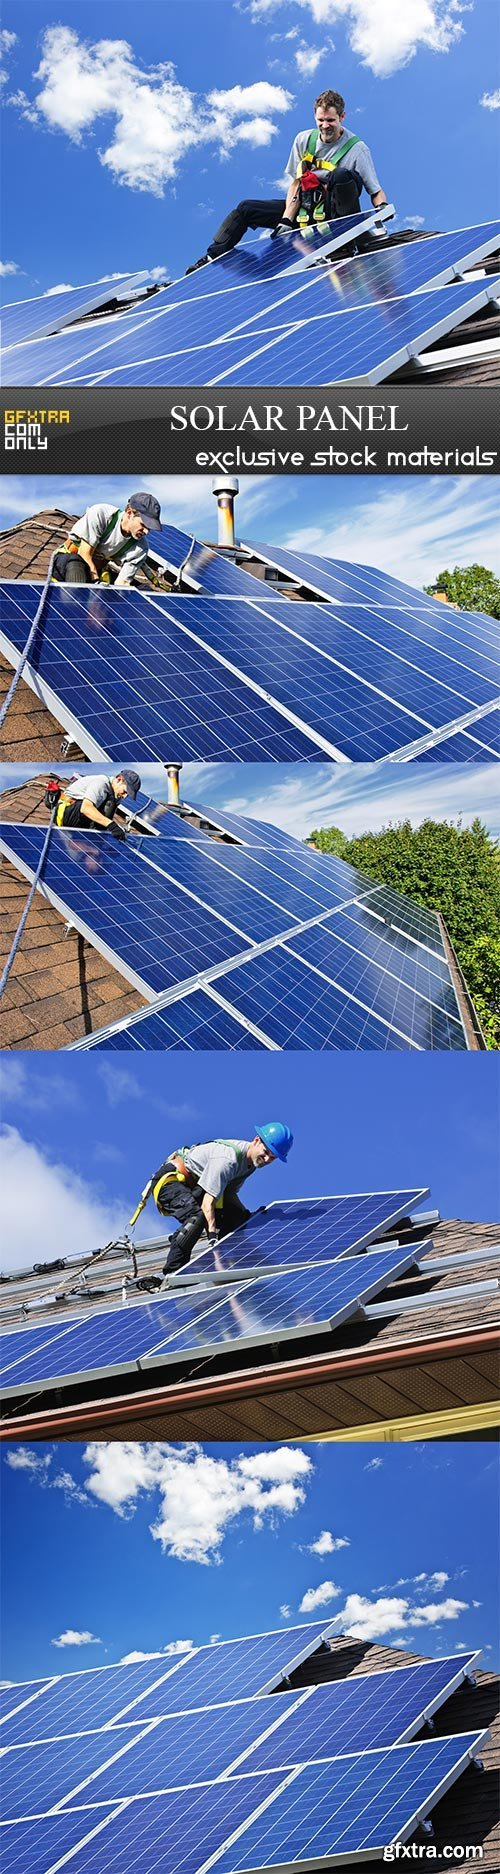 Solar Panel - 5 UHQ JPEG